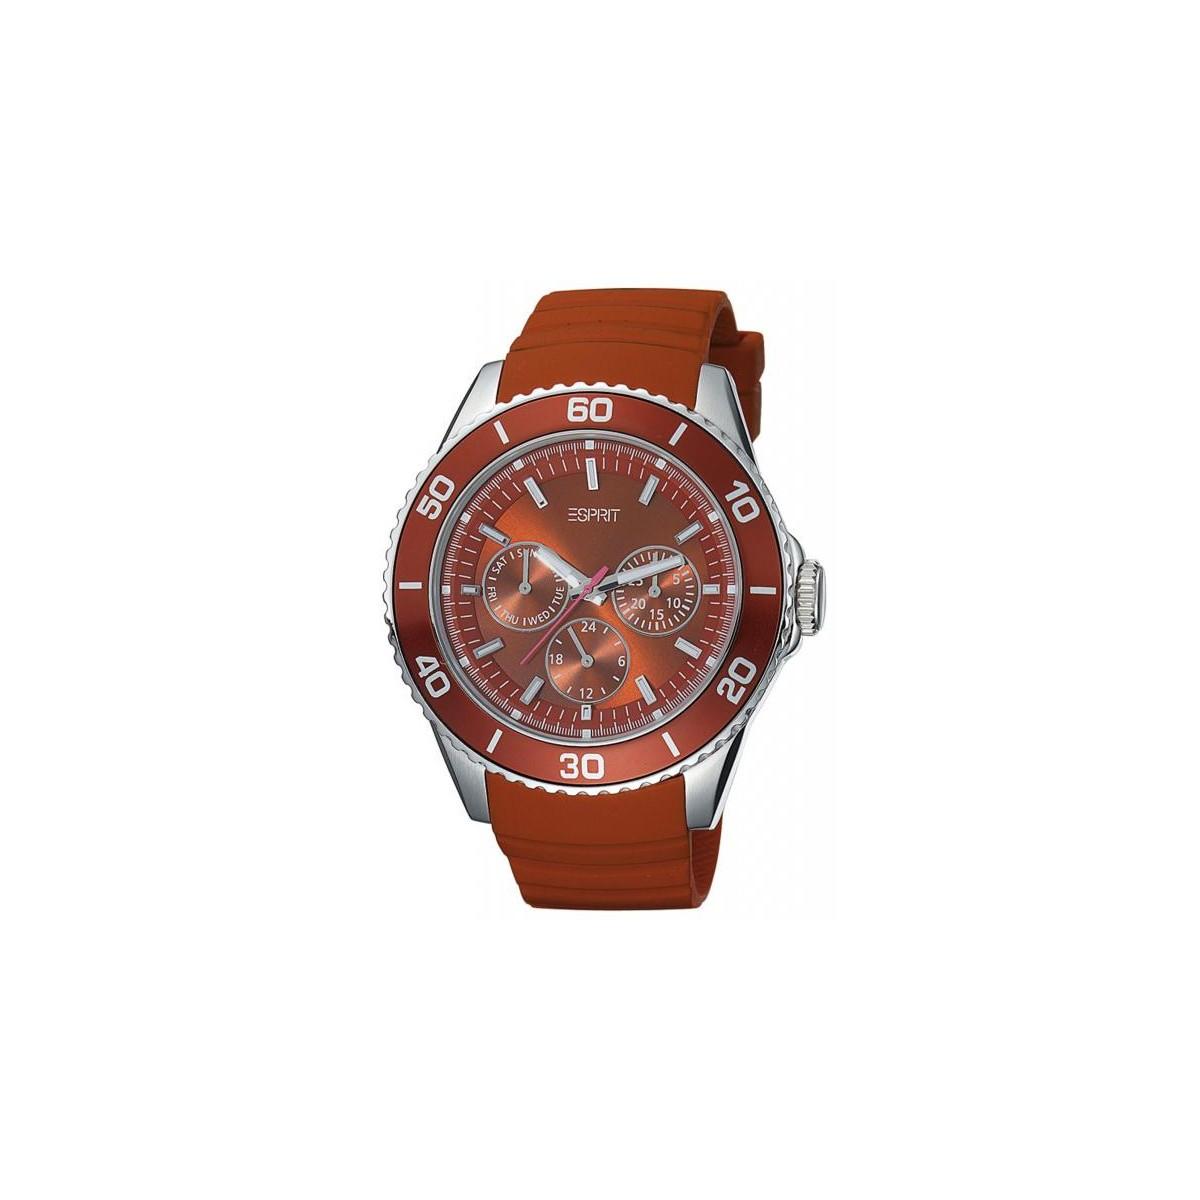 https://www.gaberjoyeria.com/2019-thickbox_default/reloj-esprit-103622002.jpg